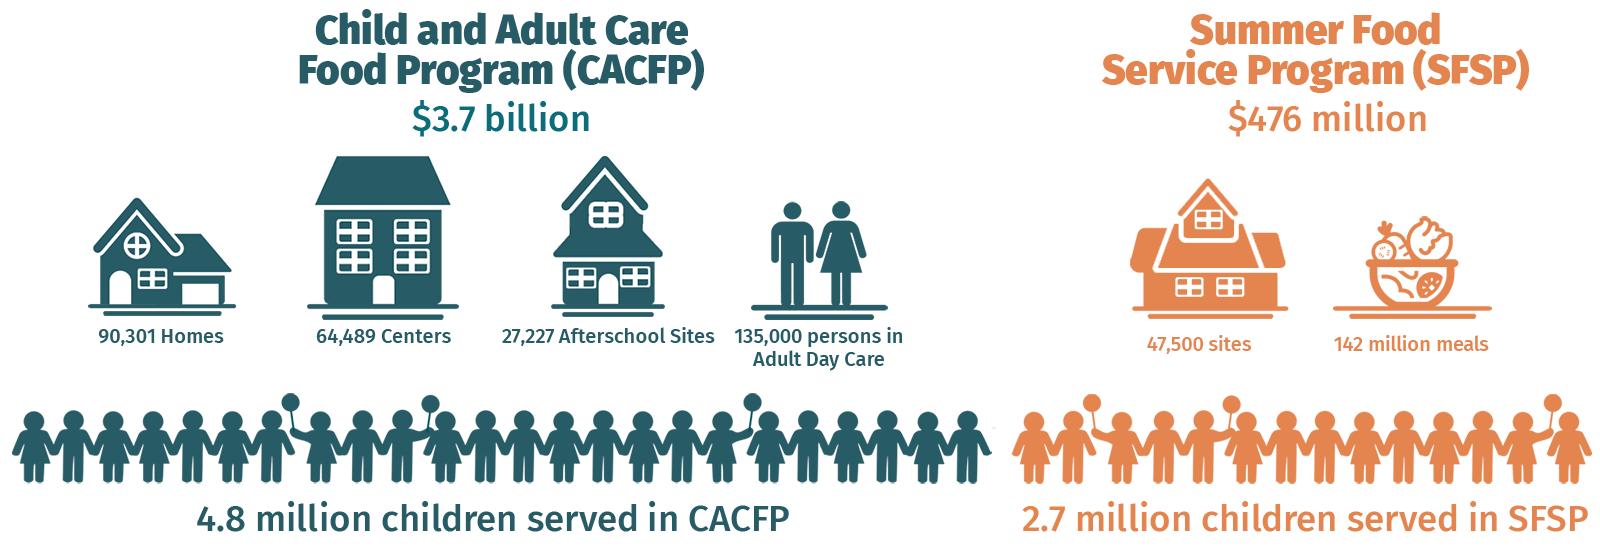 CACFP SFSP Infographic 4